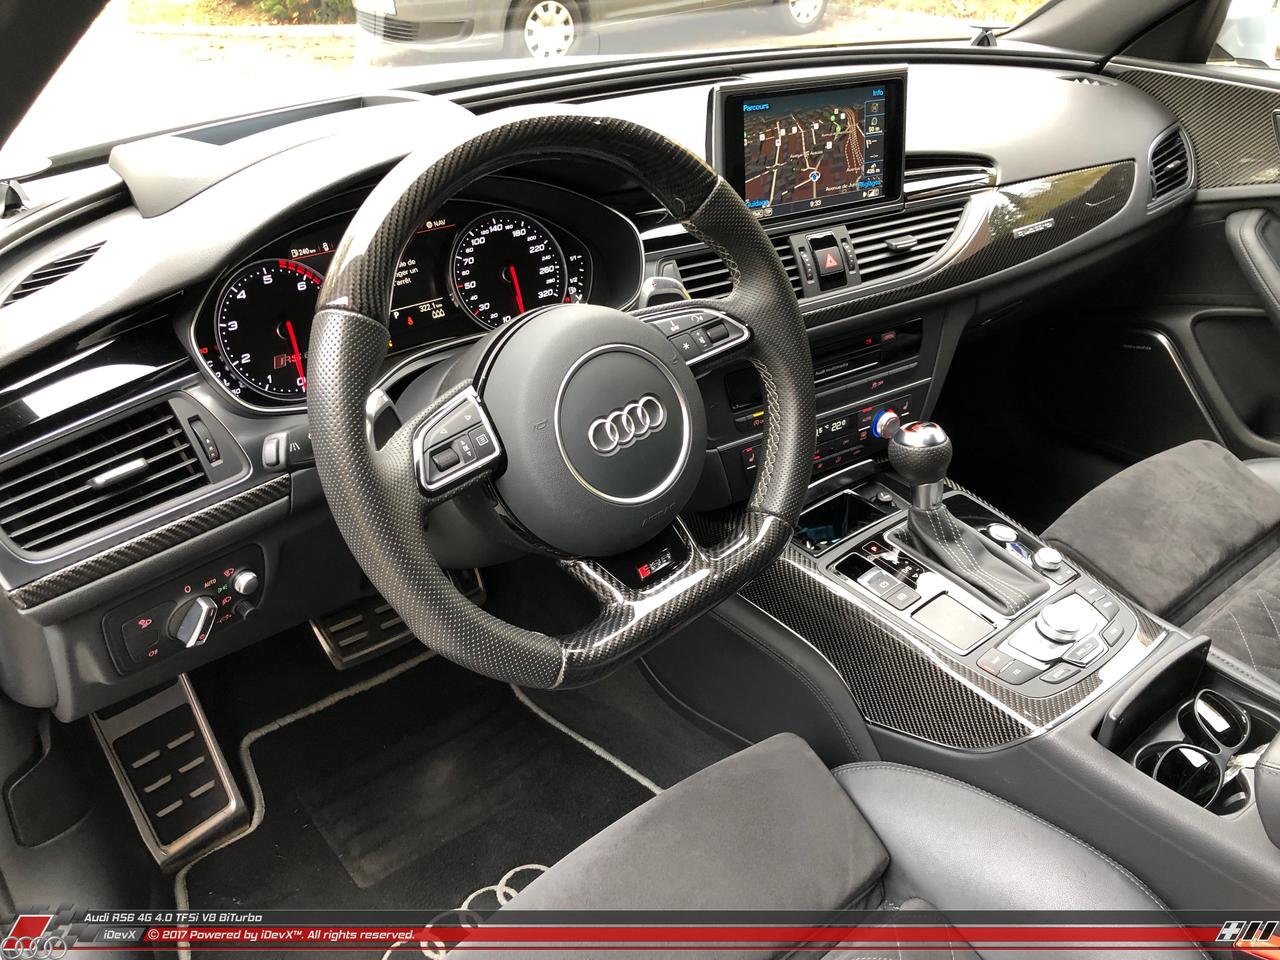 10_11.2018_Audi-RS6_iDevX_011.png